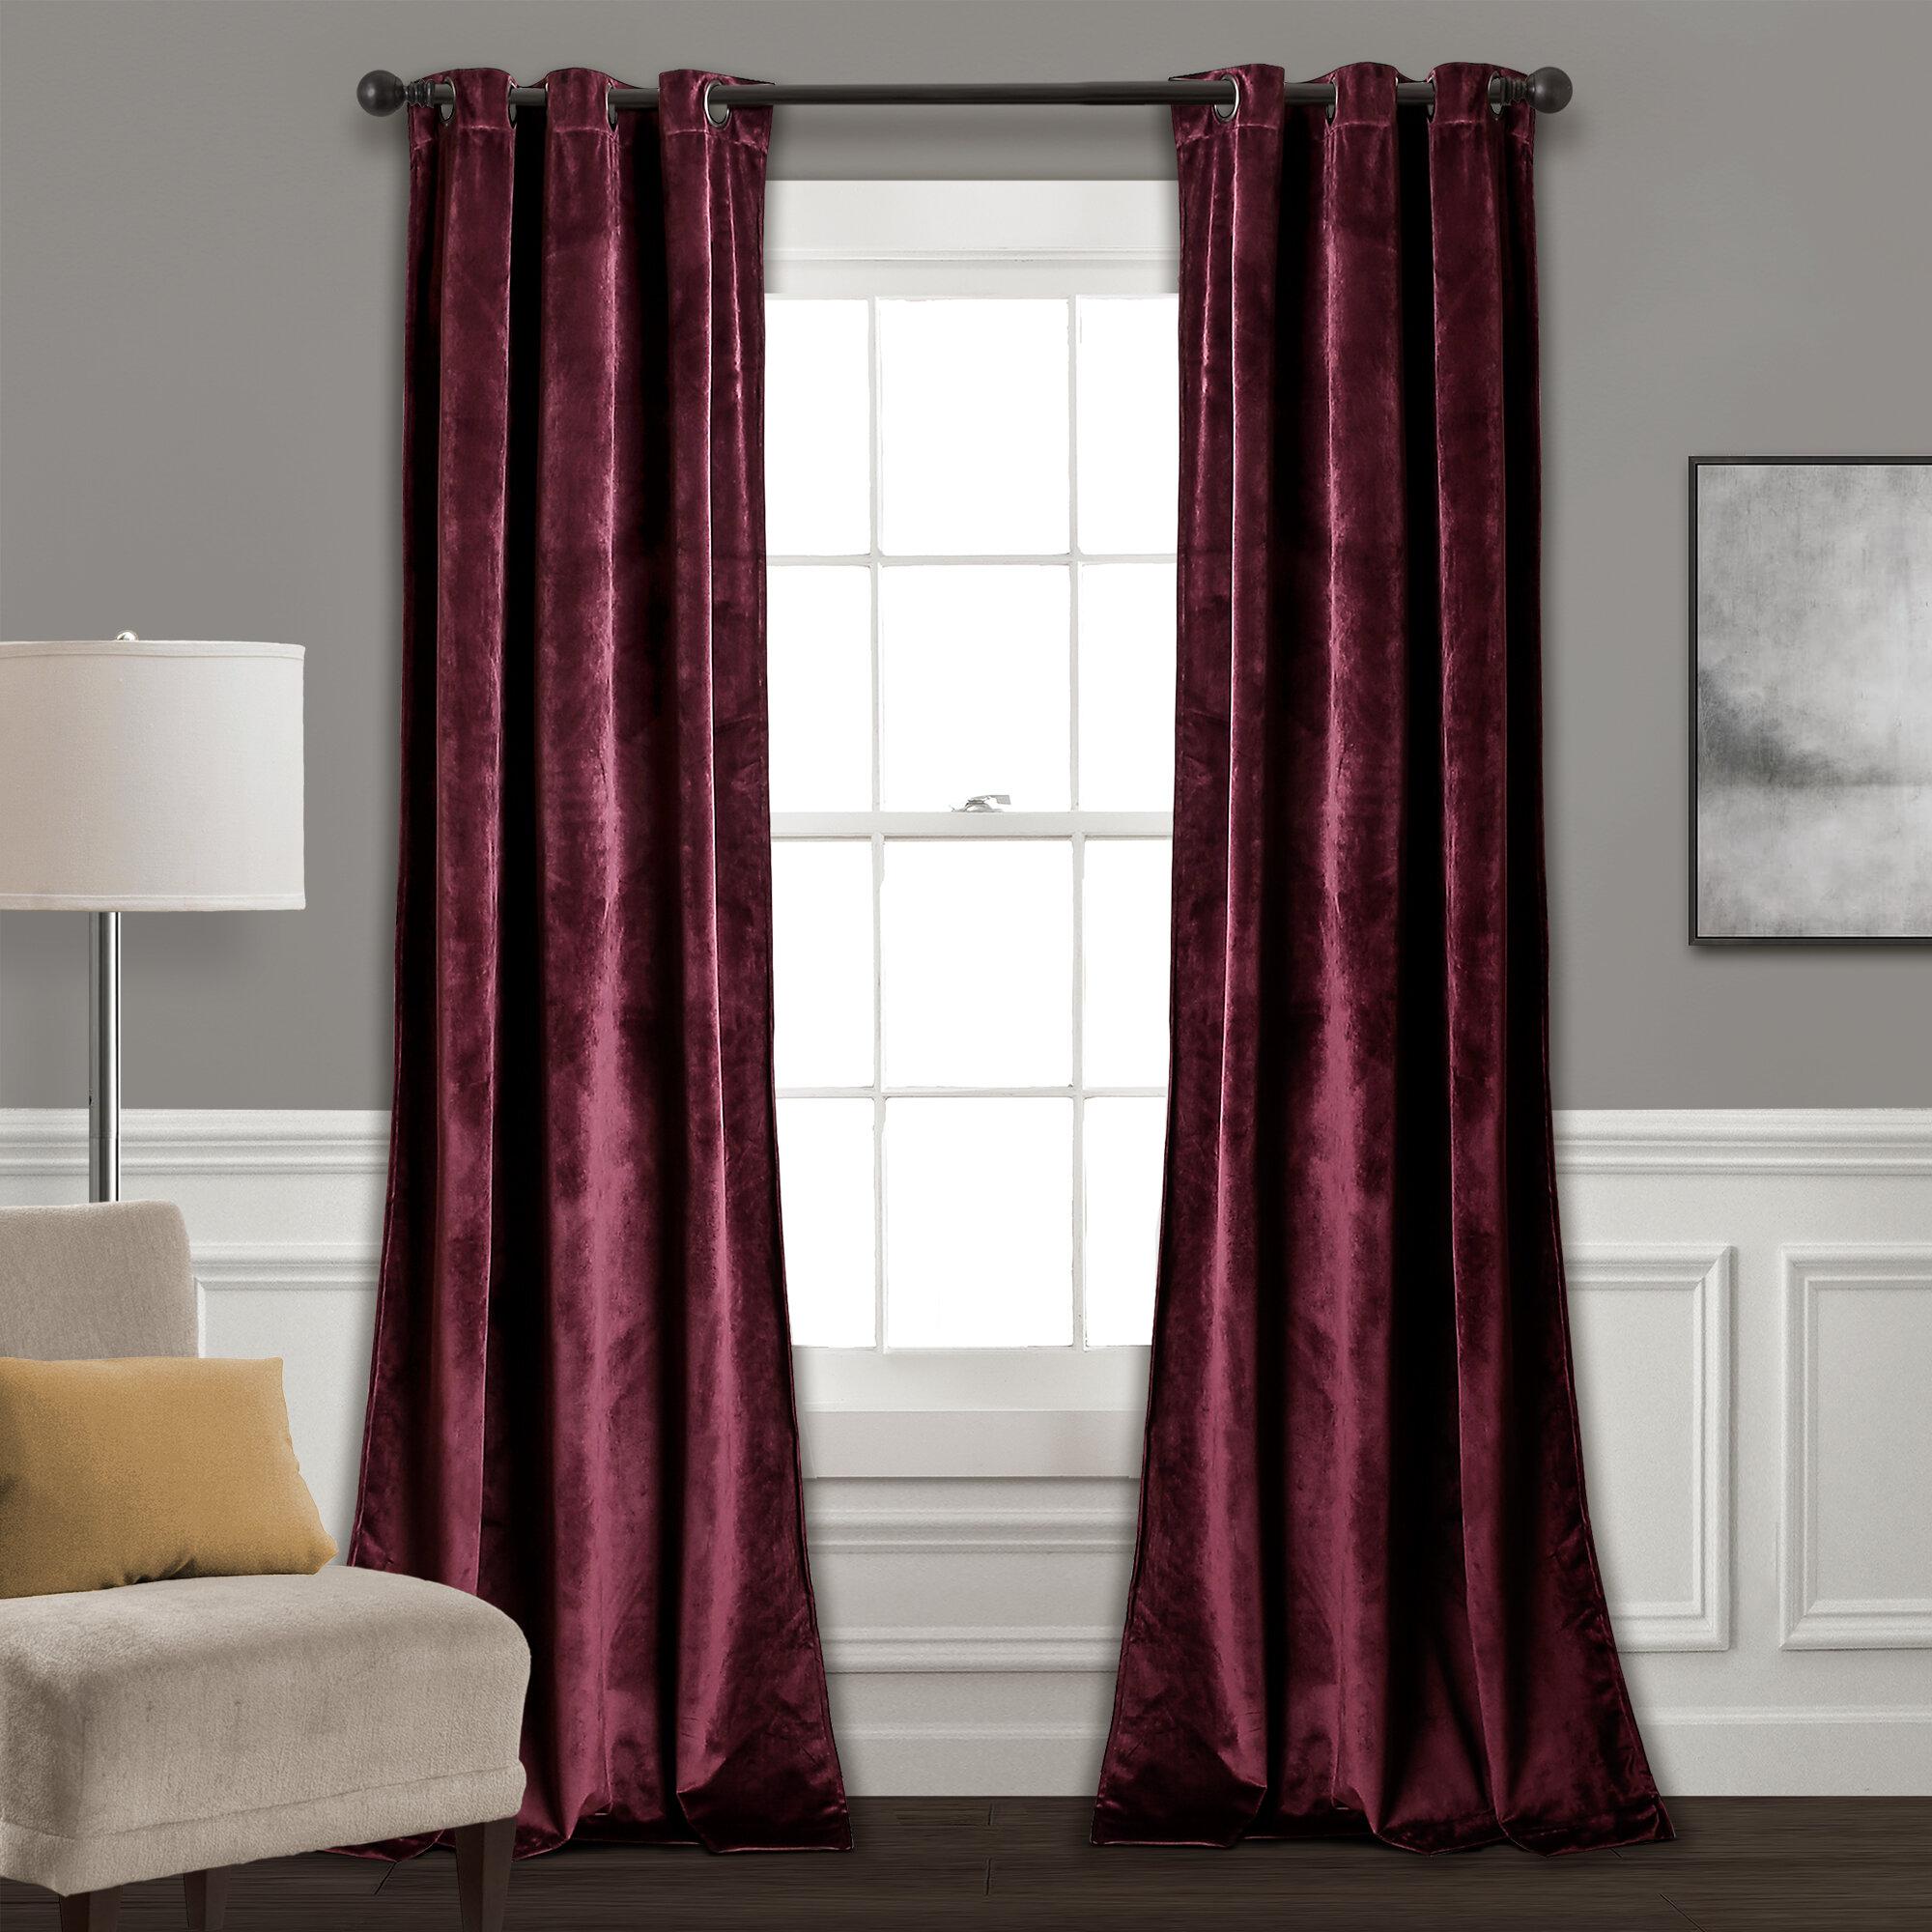 Belknap Solid Room Darkening Grommet Curtain Panels Reviews Joss Main